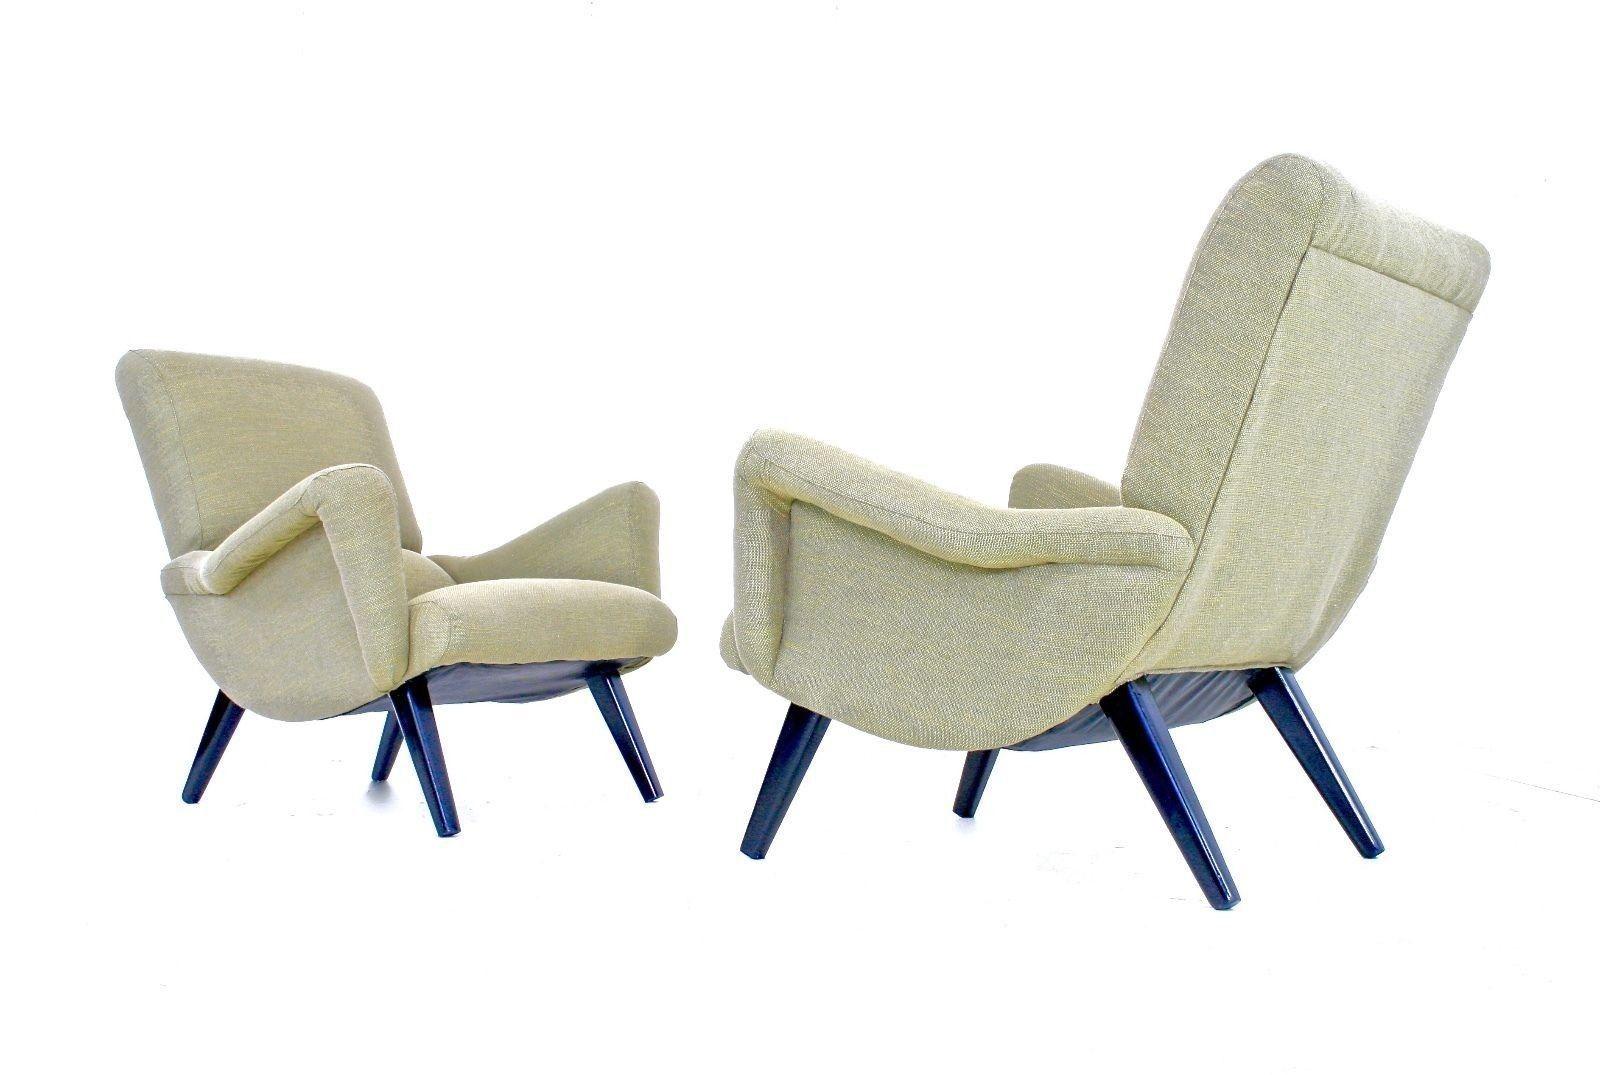 mid century sessel von g plan 1960er 2er set bei pamono. Black Bedroom Furniture Sets. Home Design Ideas